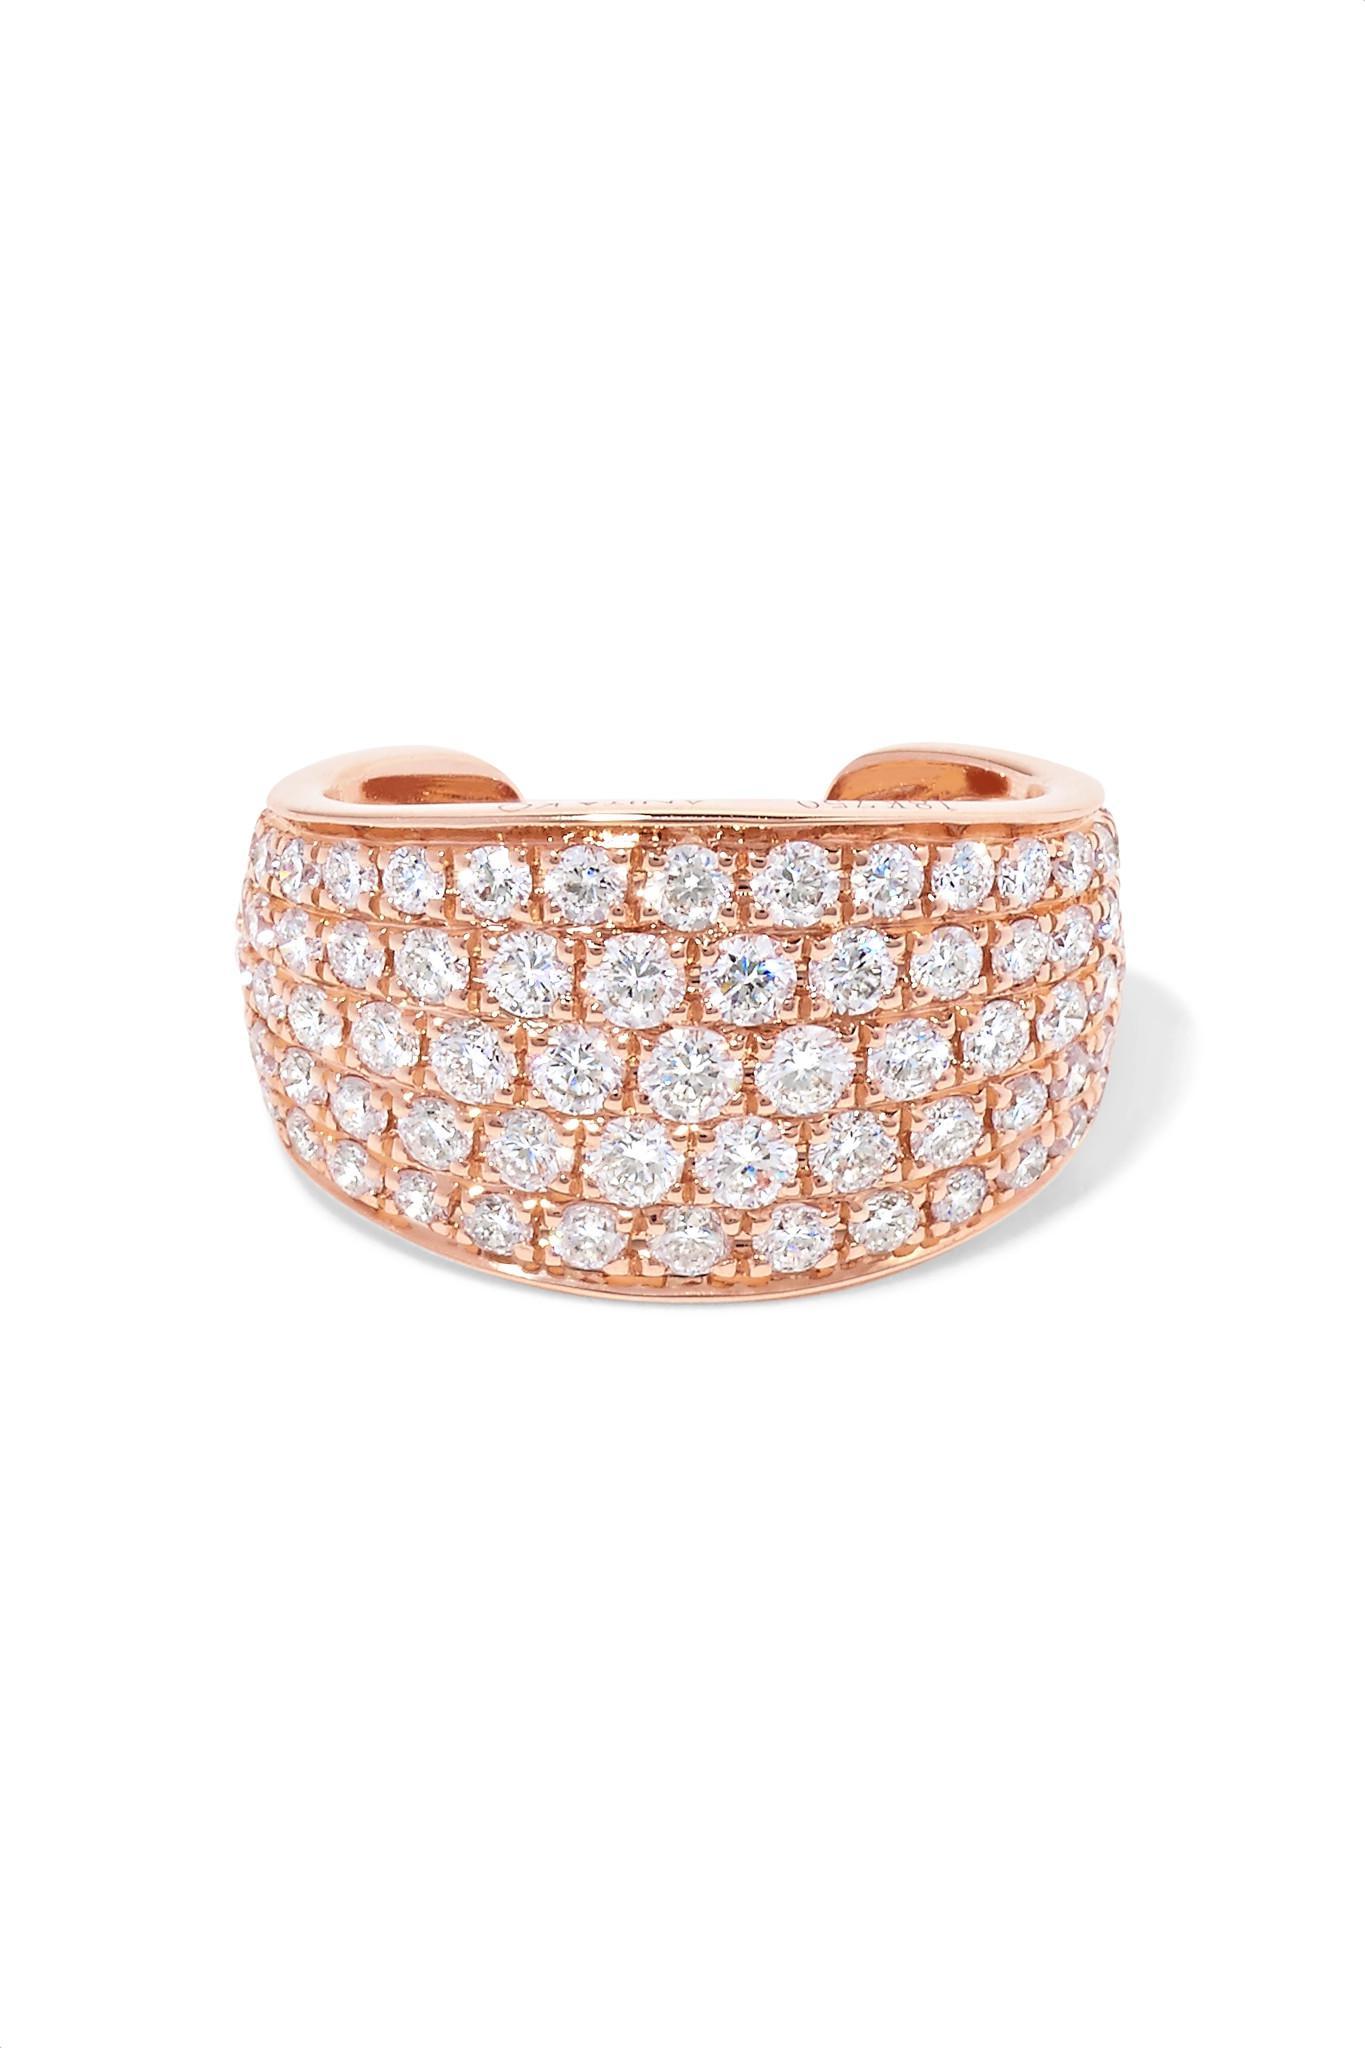 Anita Ko Galaxy 18-karat Rose Gold Diamond Ring eAq2VeQ5pm